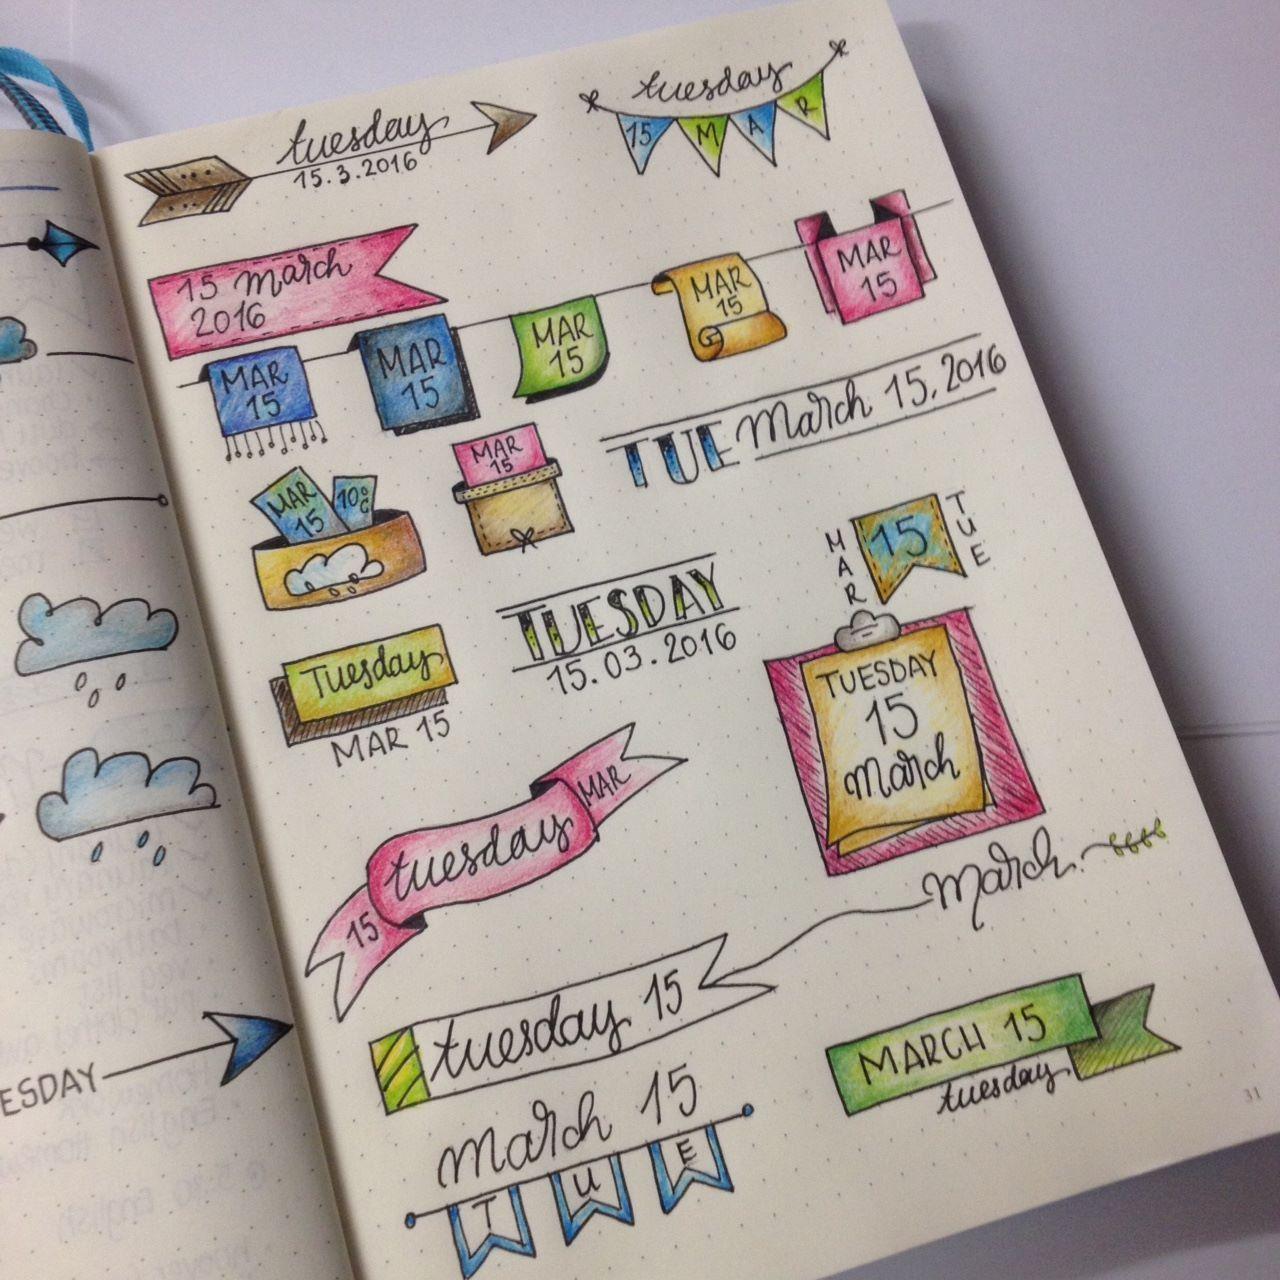 Bujo daily header ideas from the bullet journal junkies facebook